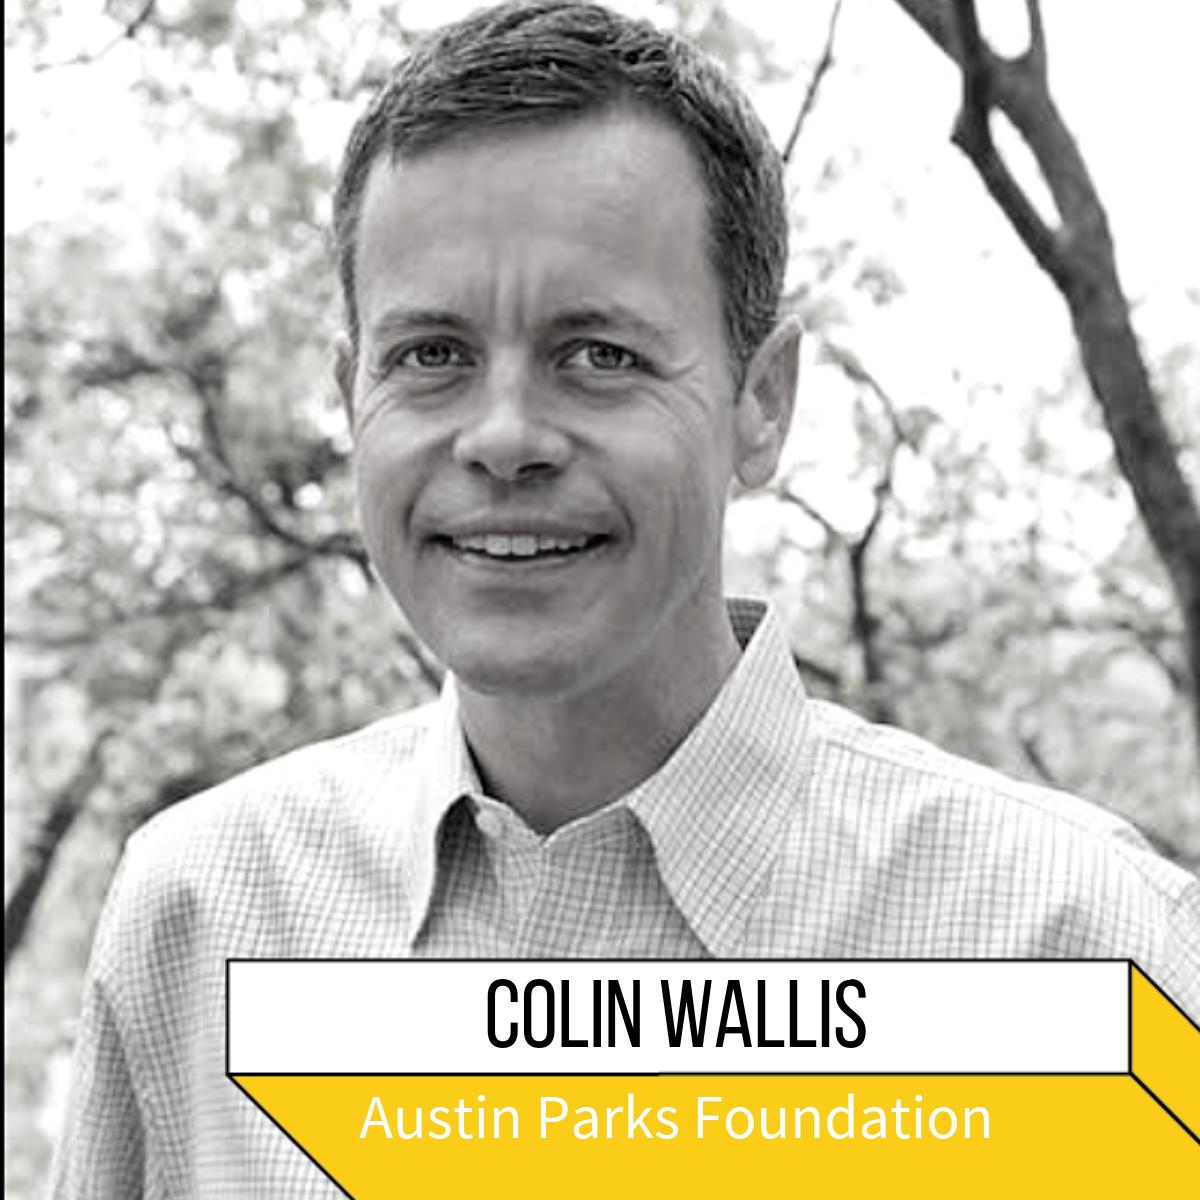 Colin Wallis Org.png